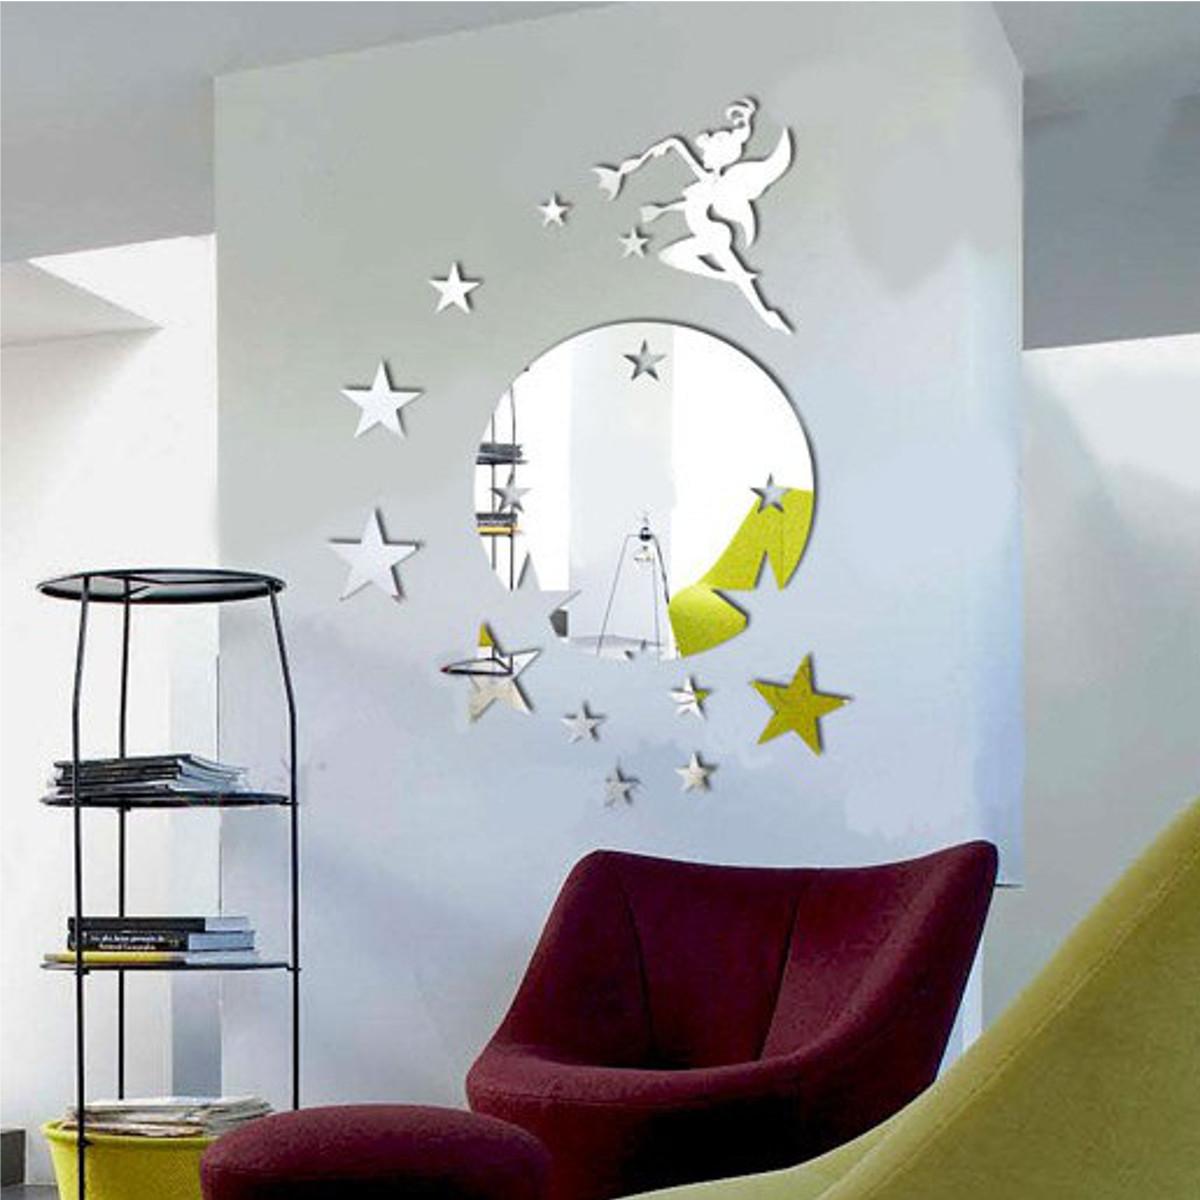 6x herausnehmbar feenhafte stern spiegel dekor kunst wand for Stern oder spiegel